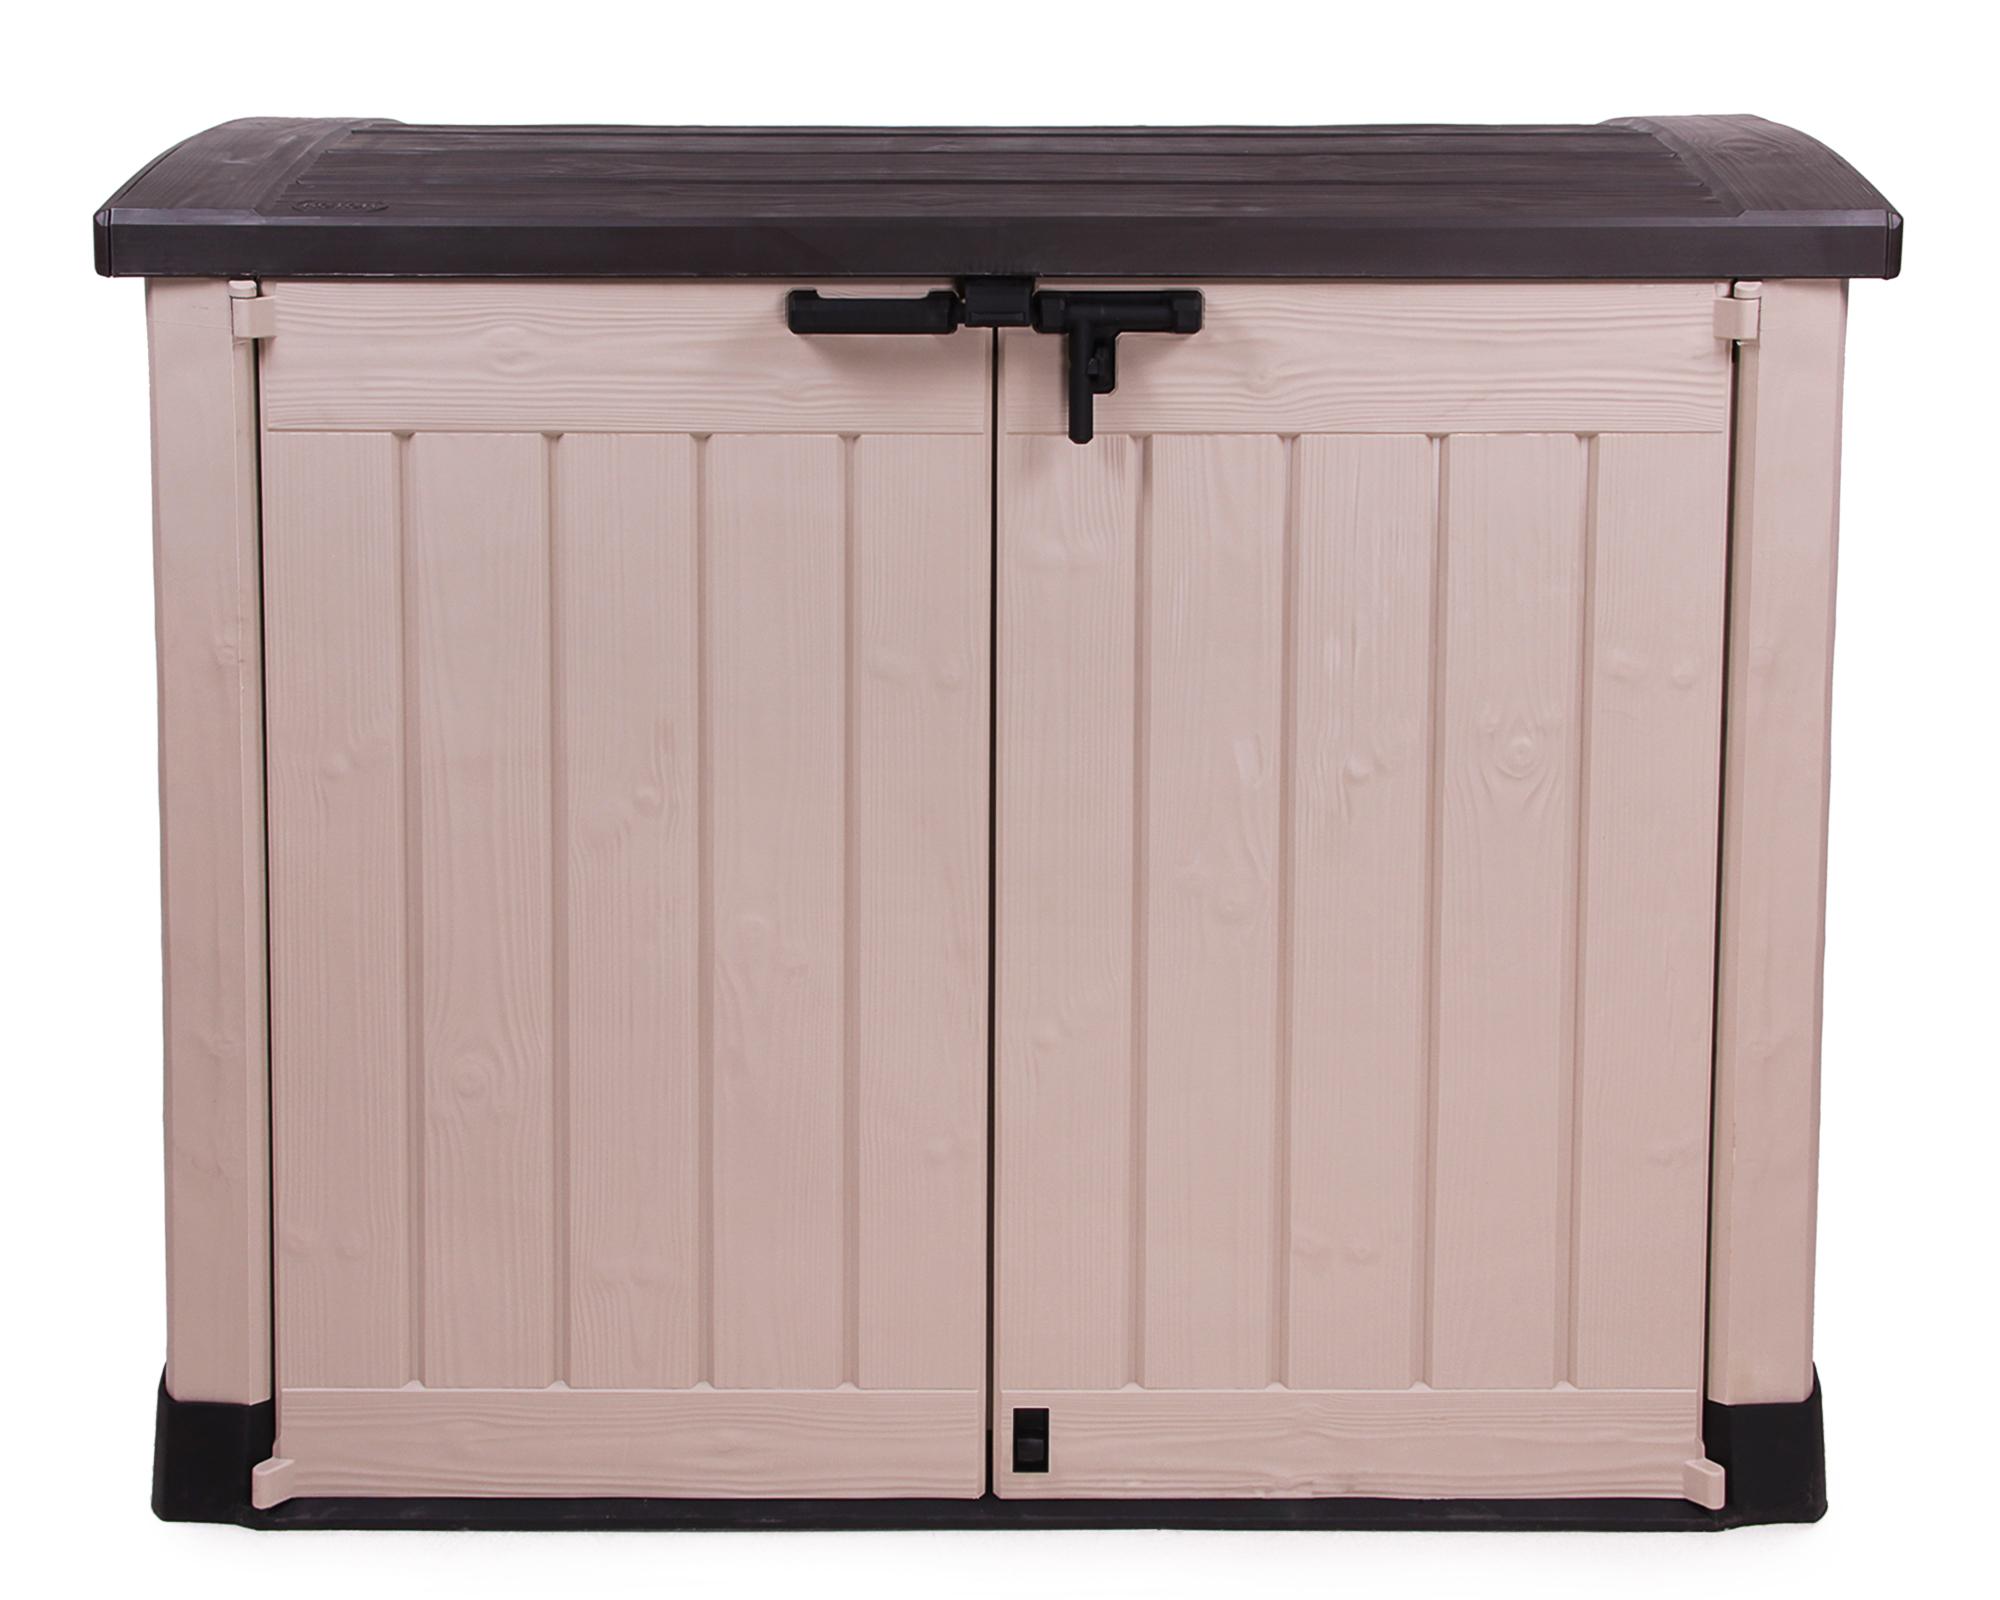 ondis24 keter m lltonnebox ger teschuppen gartenbox arc beige g nstig online kaufen. Black Bedroom Furniture Sets. Home Design Ideas